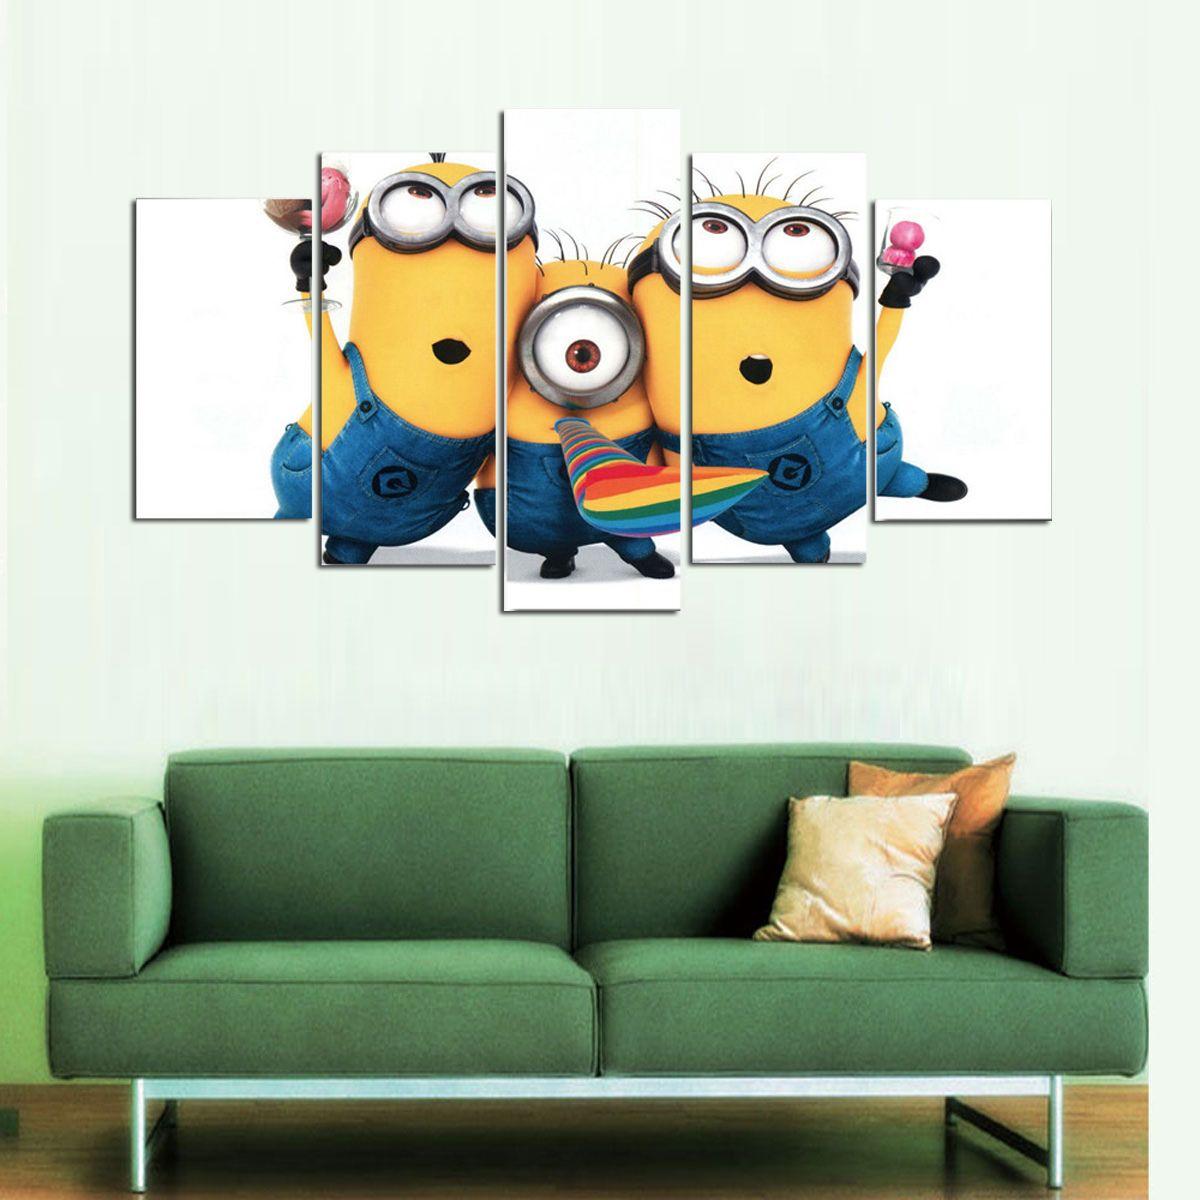 Compre Minions Thank You Gifs, 5 Piezas Home Decor Hd Impreso Arte ...